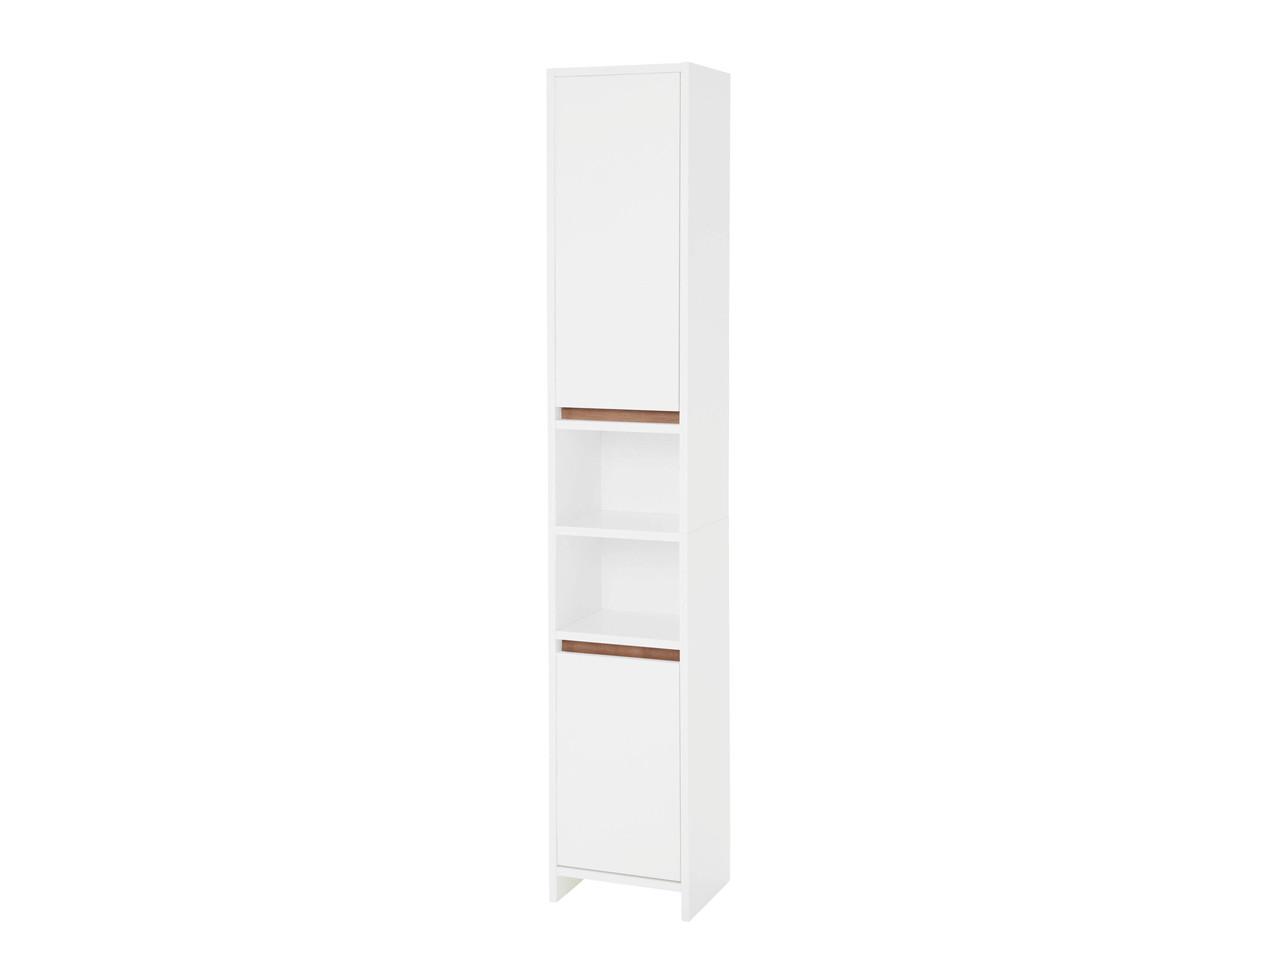 Livarno Living Tall Bathroom Cabinet Lidl Ireland pertaining to dimensions 1278 X 959